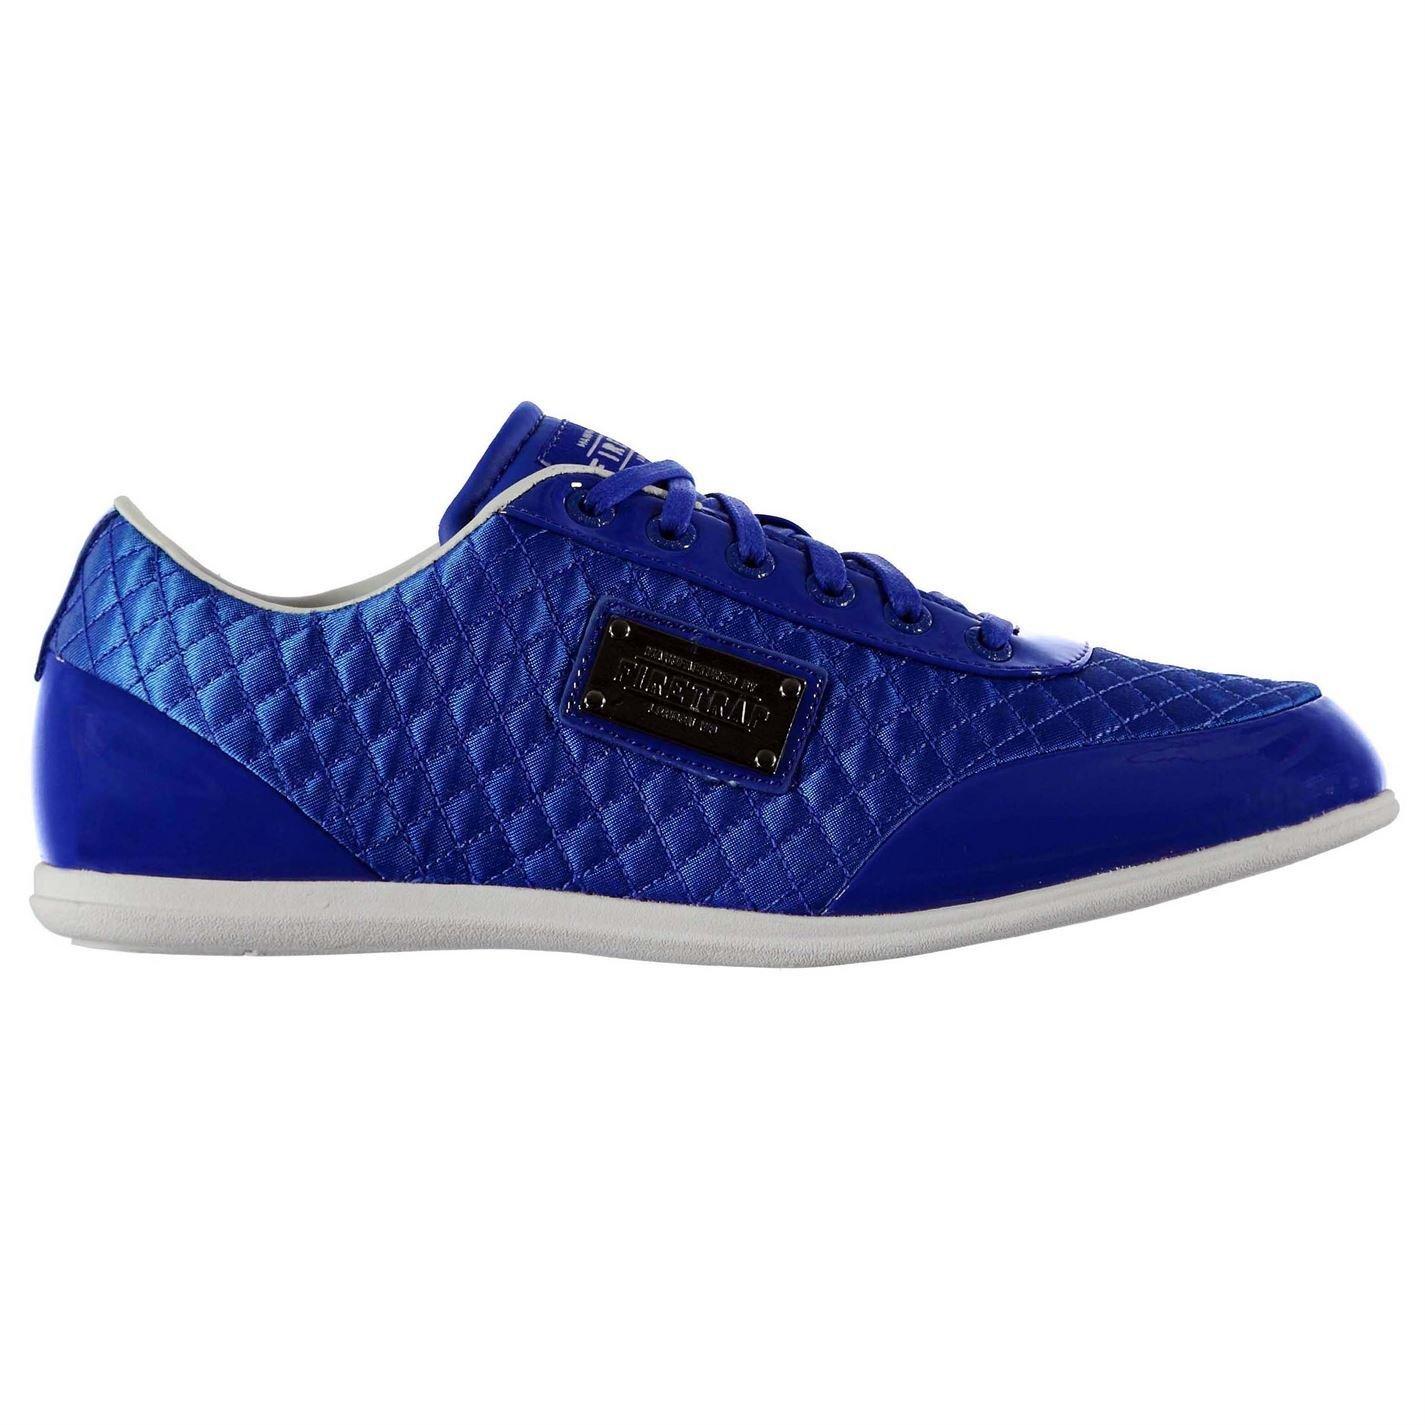 Firetrap Casual DR domello Casual Firetrap Trainer Herren Blau Fashion Turnschuhe Turnschuhe Schuhe 90e6c9